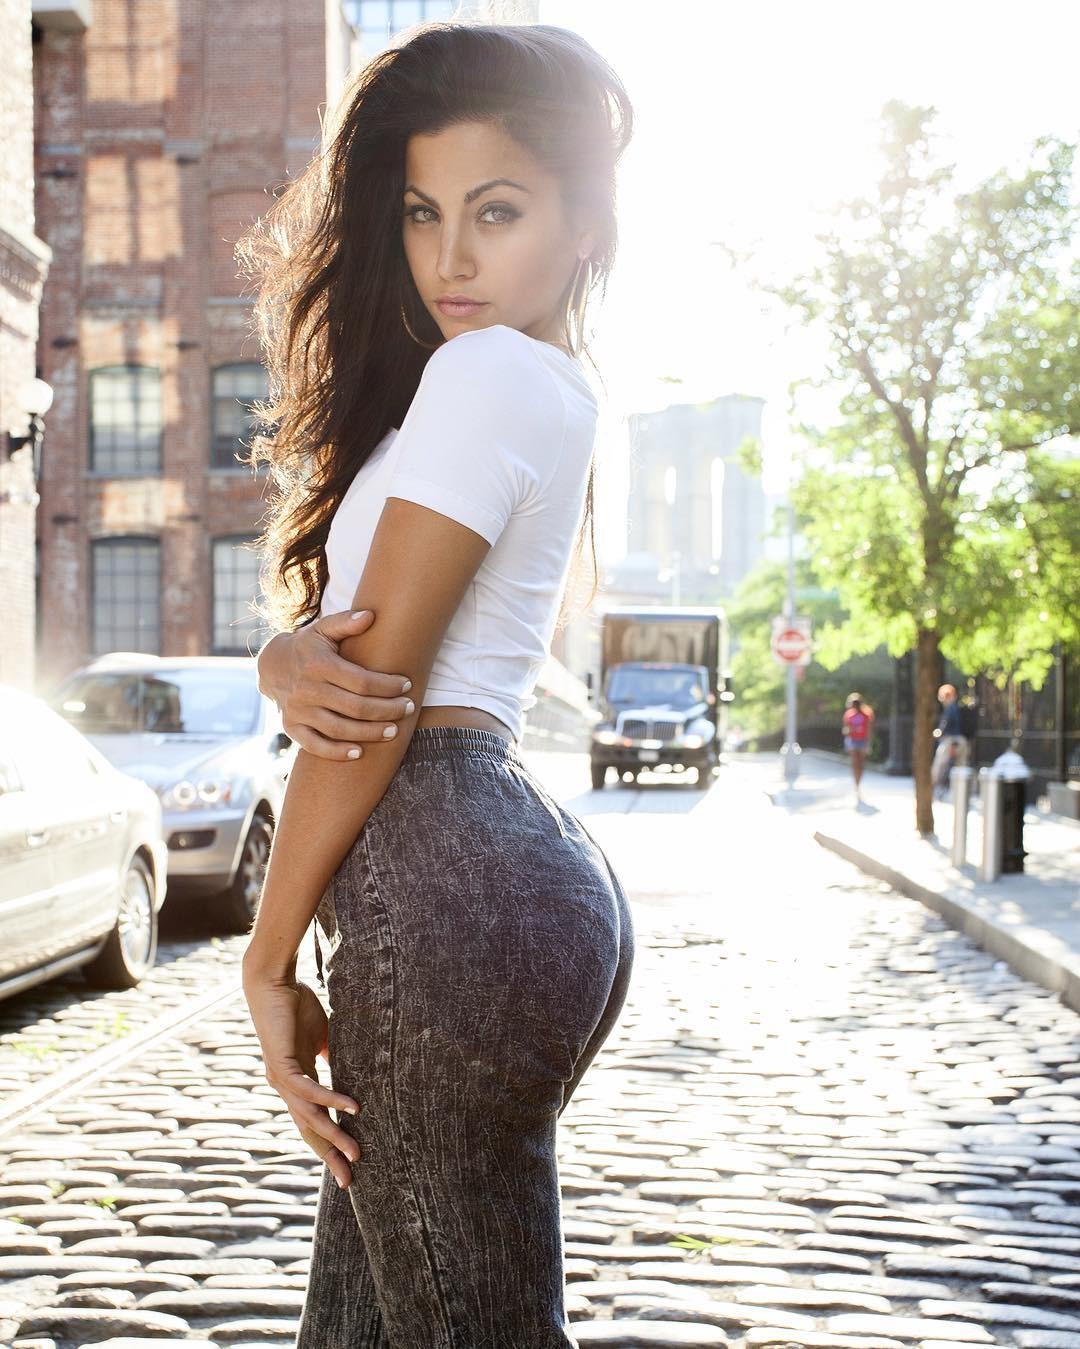 Wallpaper : women, model, ass, dress, pattern, fashion